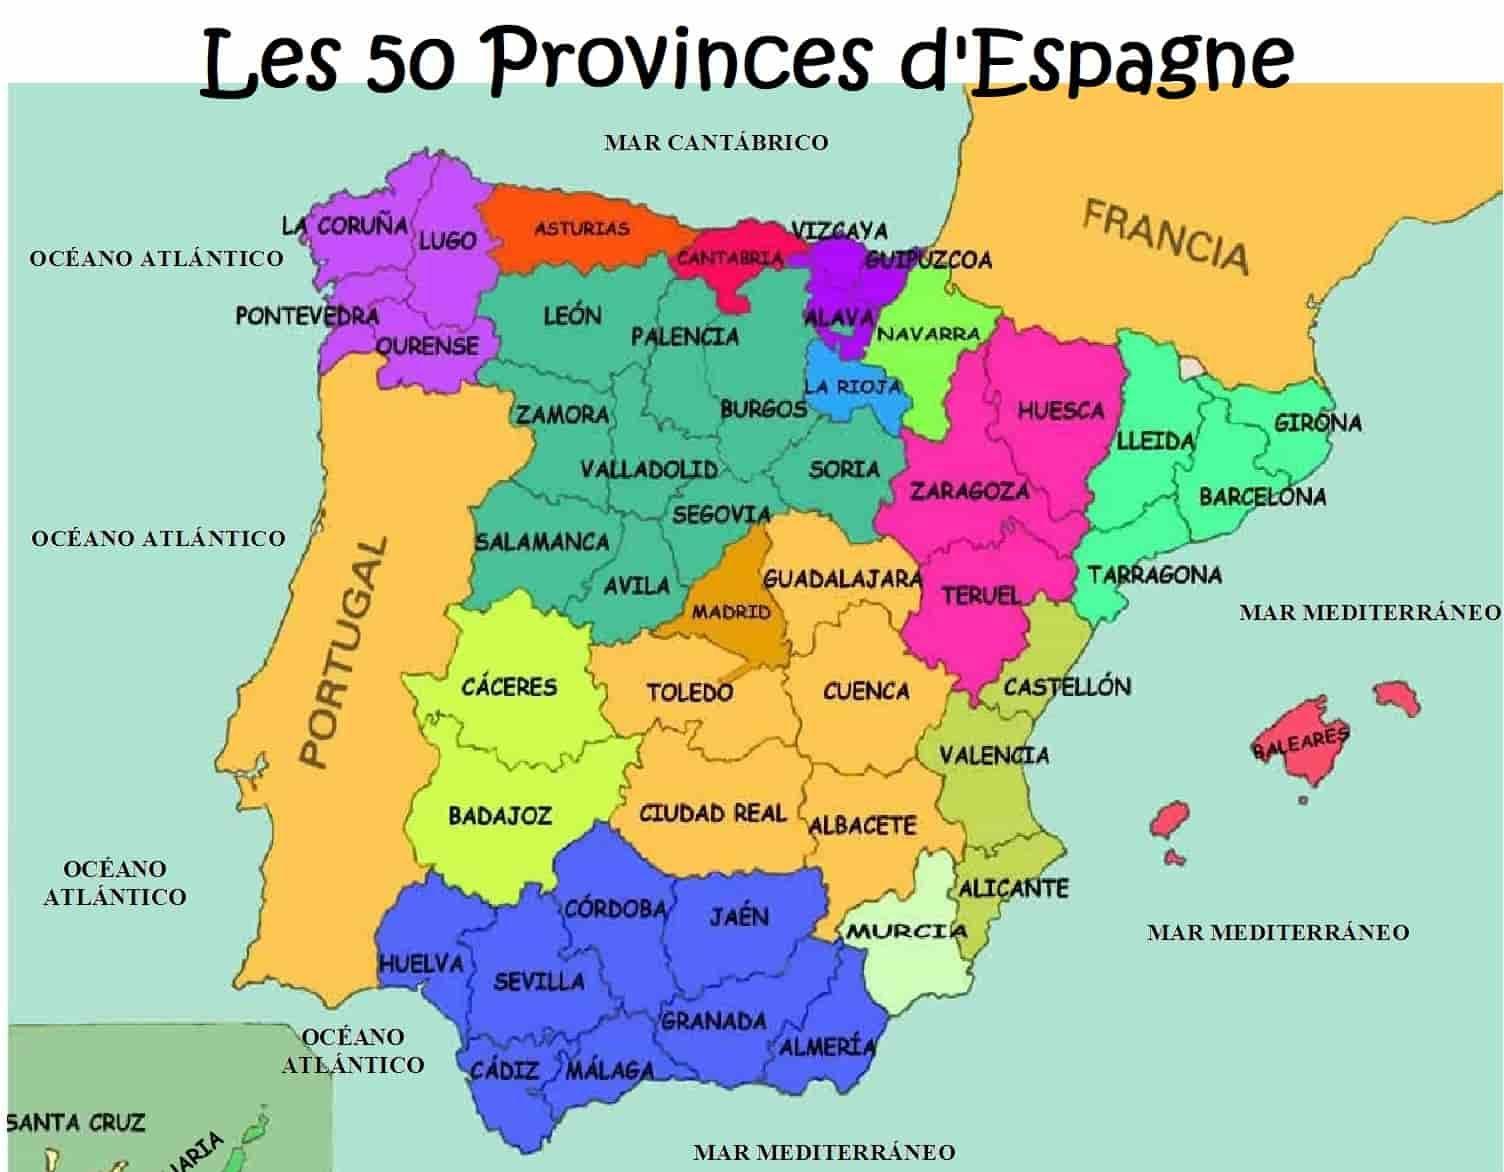 Les 50 Provinces D Espagne Espagne Espagne Carte Saragosse